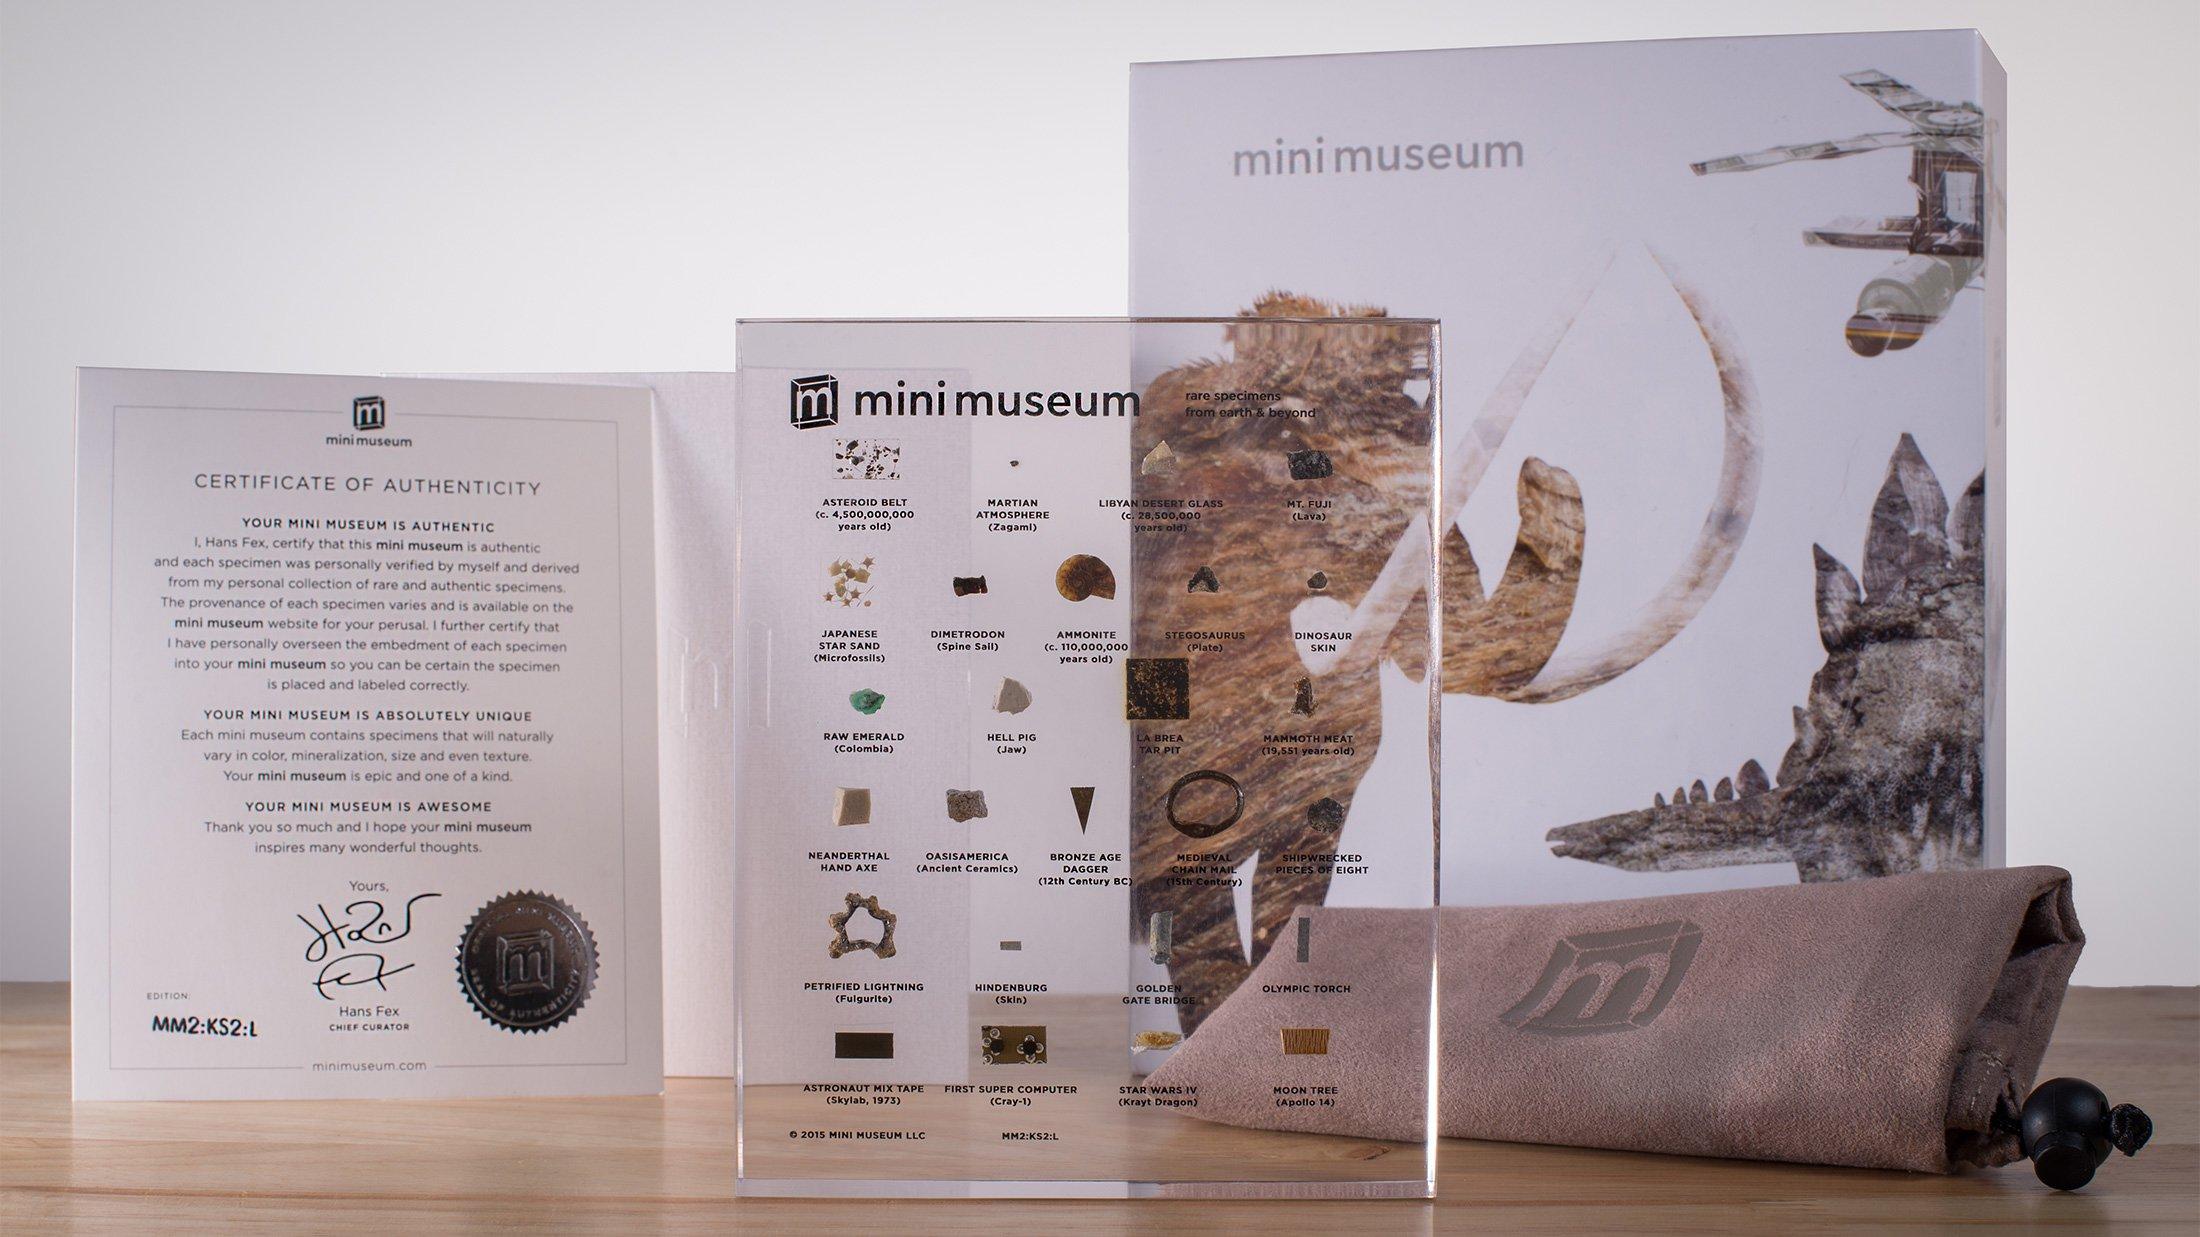 MinimeuSen